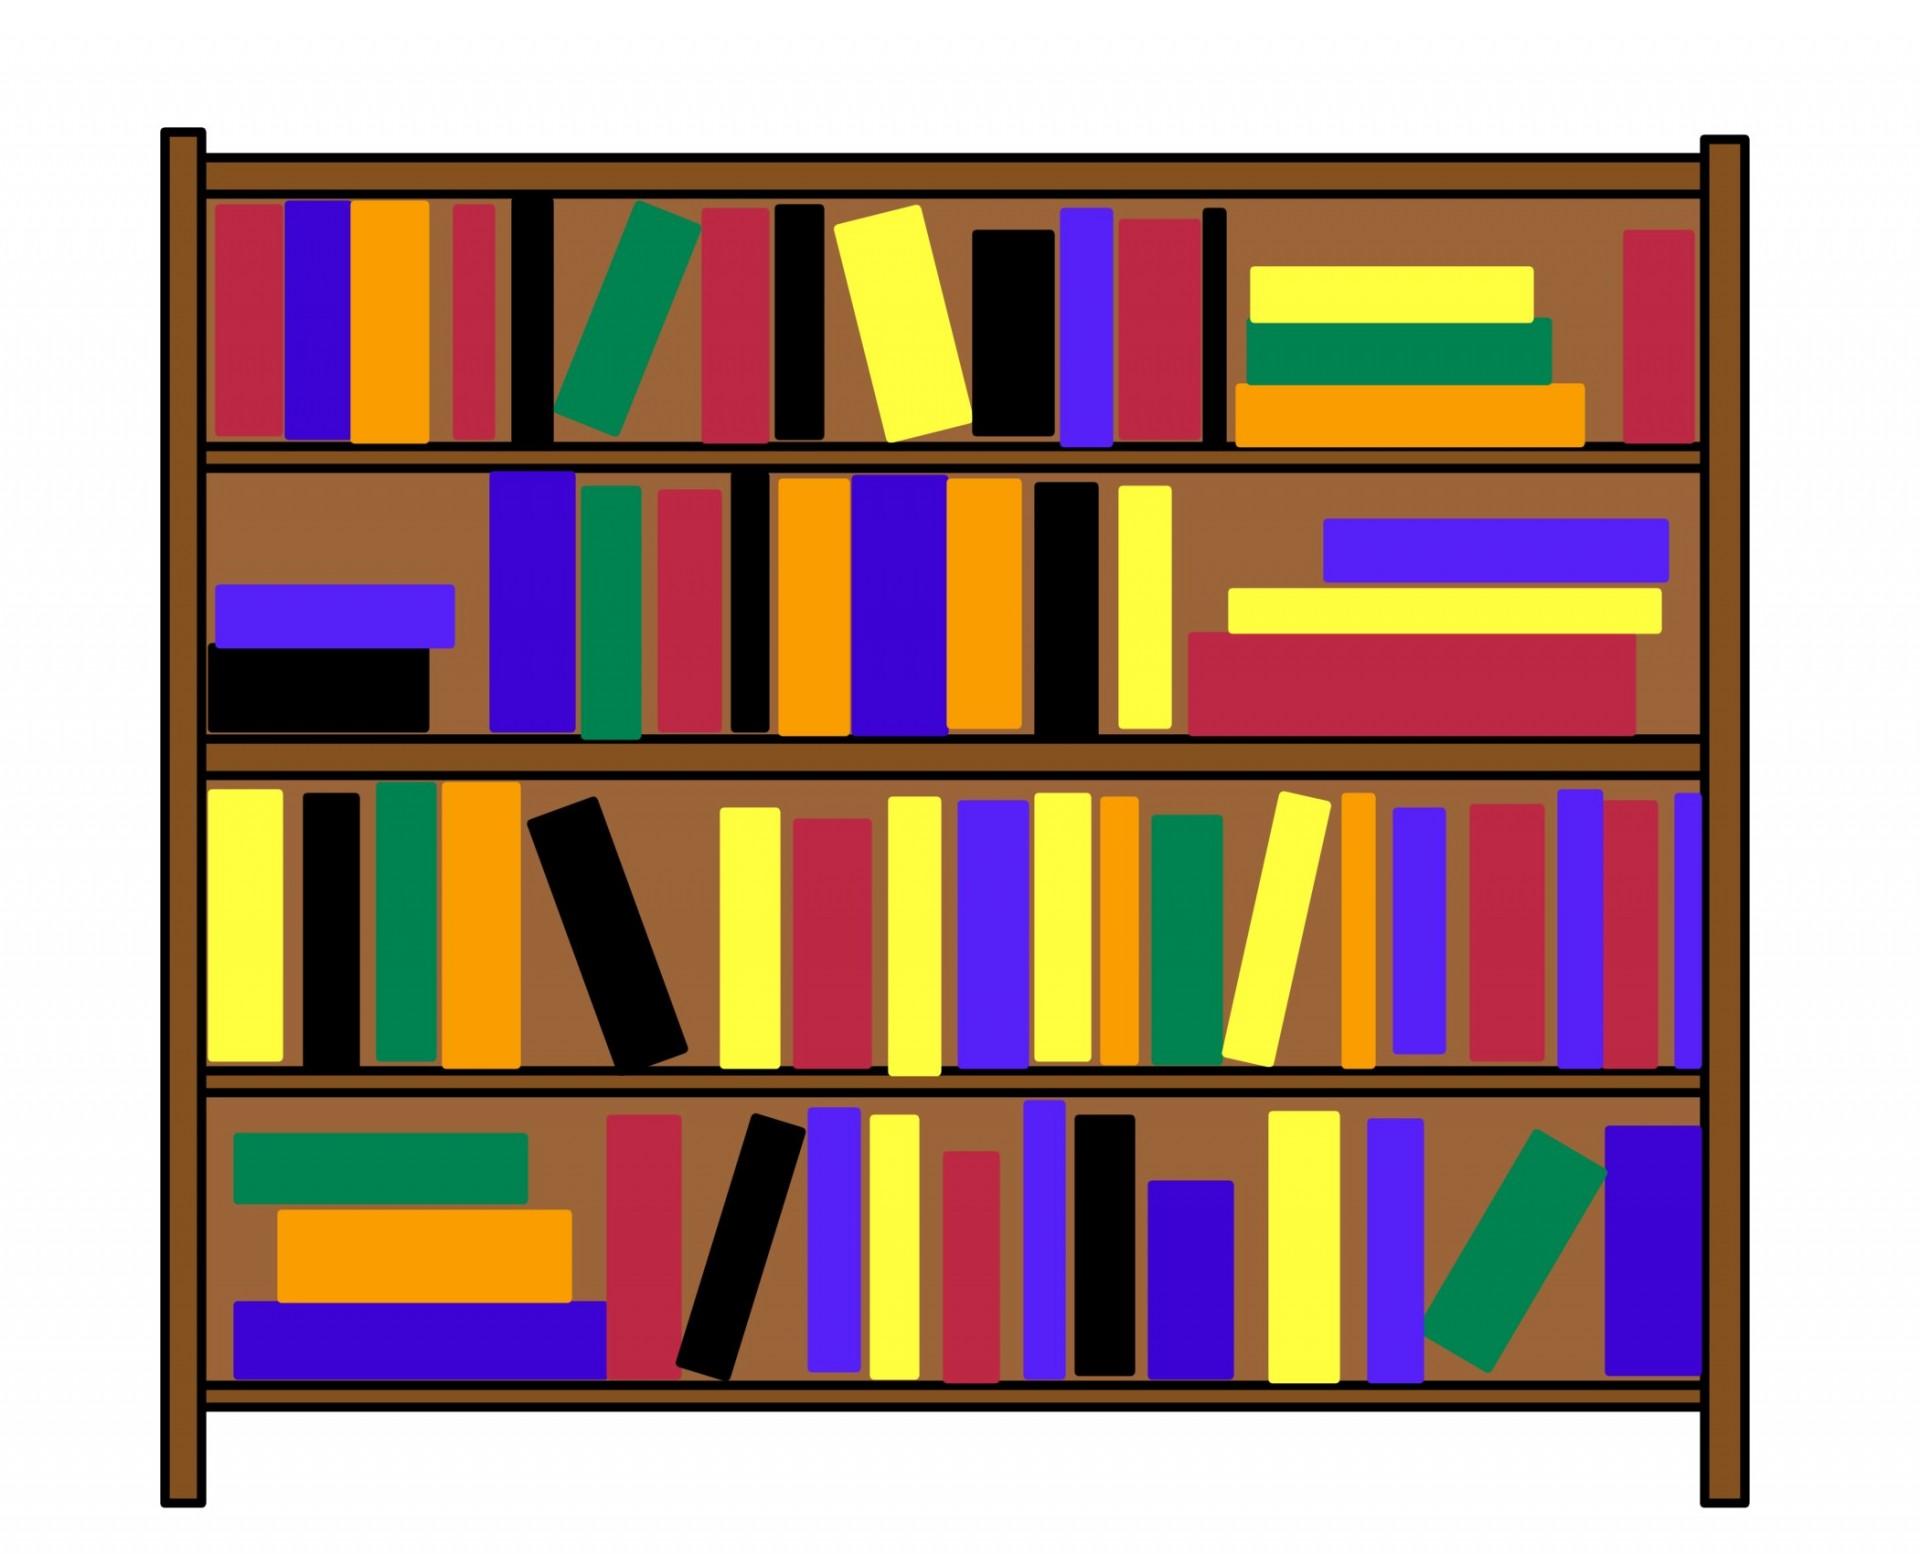 Bookshelf Clip Art Free Stock Photo-Bookshelf Clip Art Free Stock Photo-8